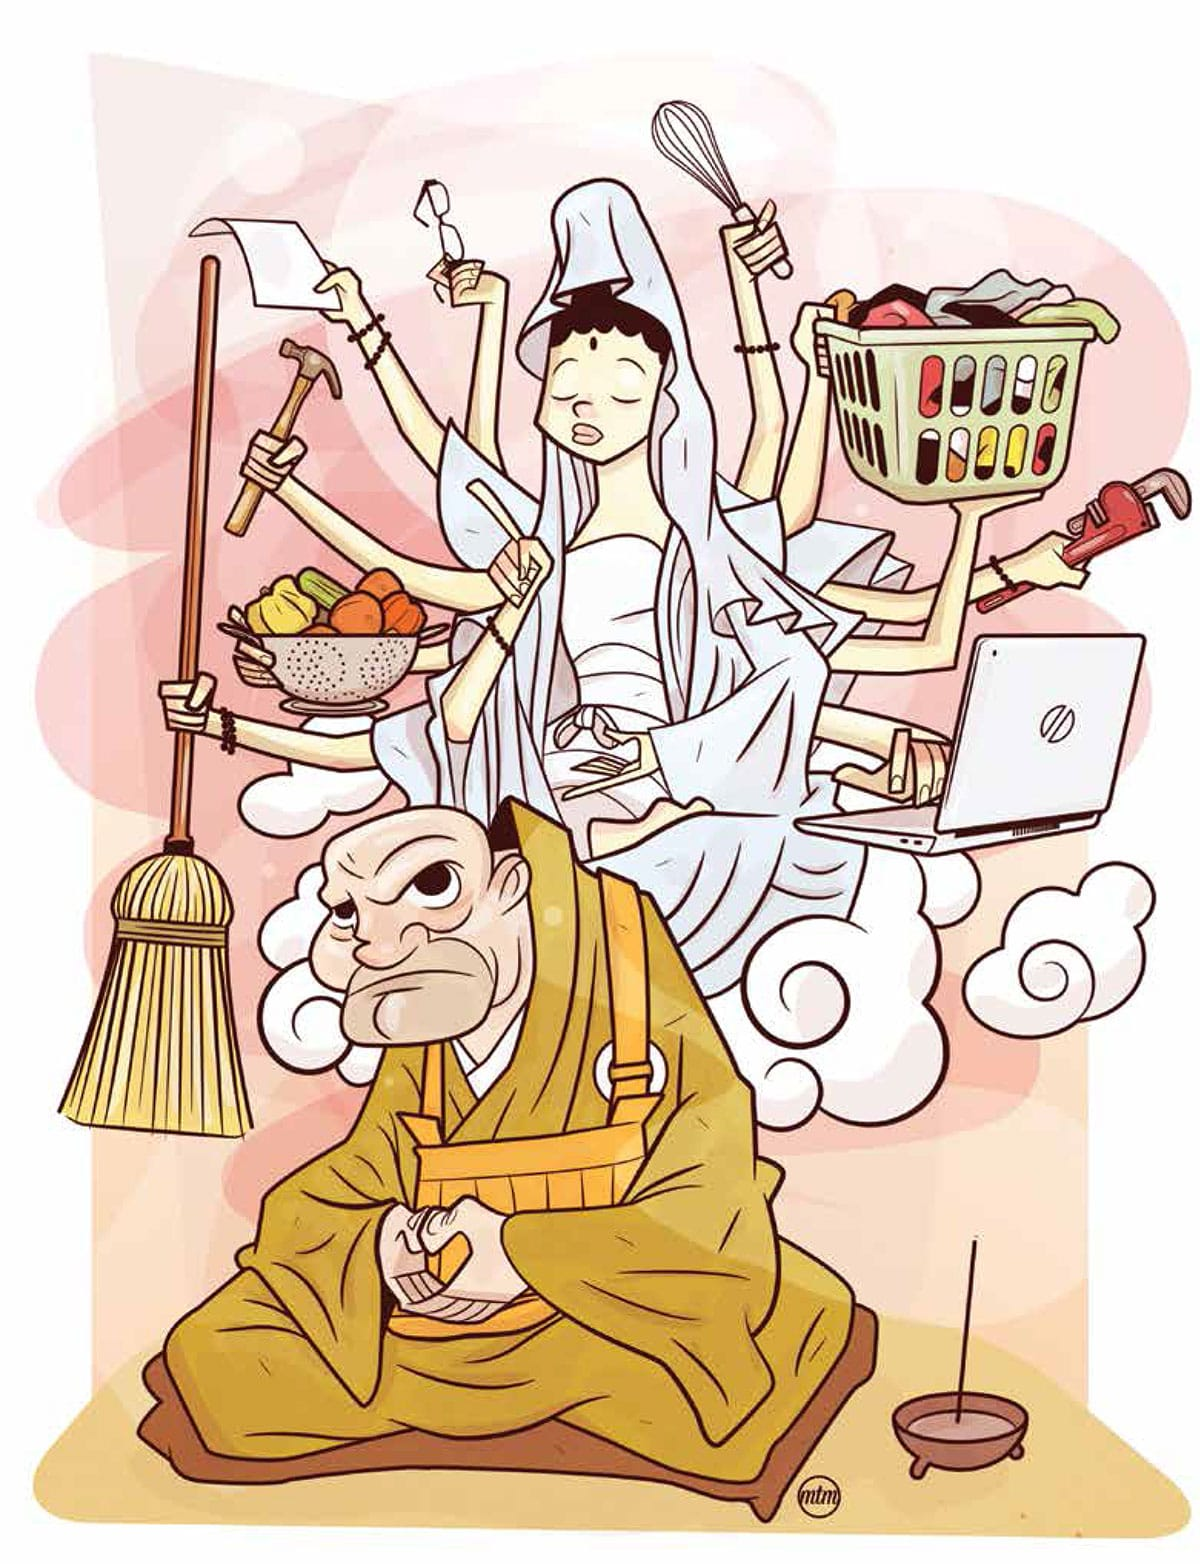 Shambhala Sun, Pat Enkyo O'Hara, Zen, Work, Lion's Roar, Buddhism